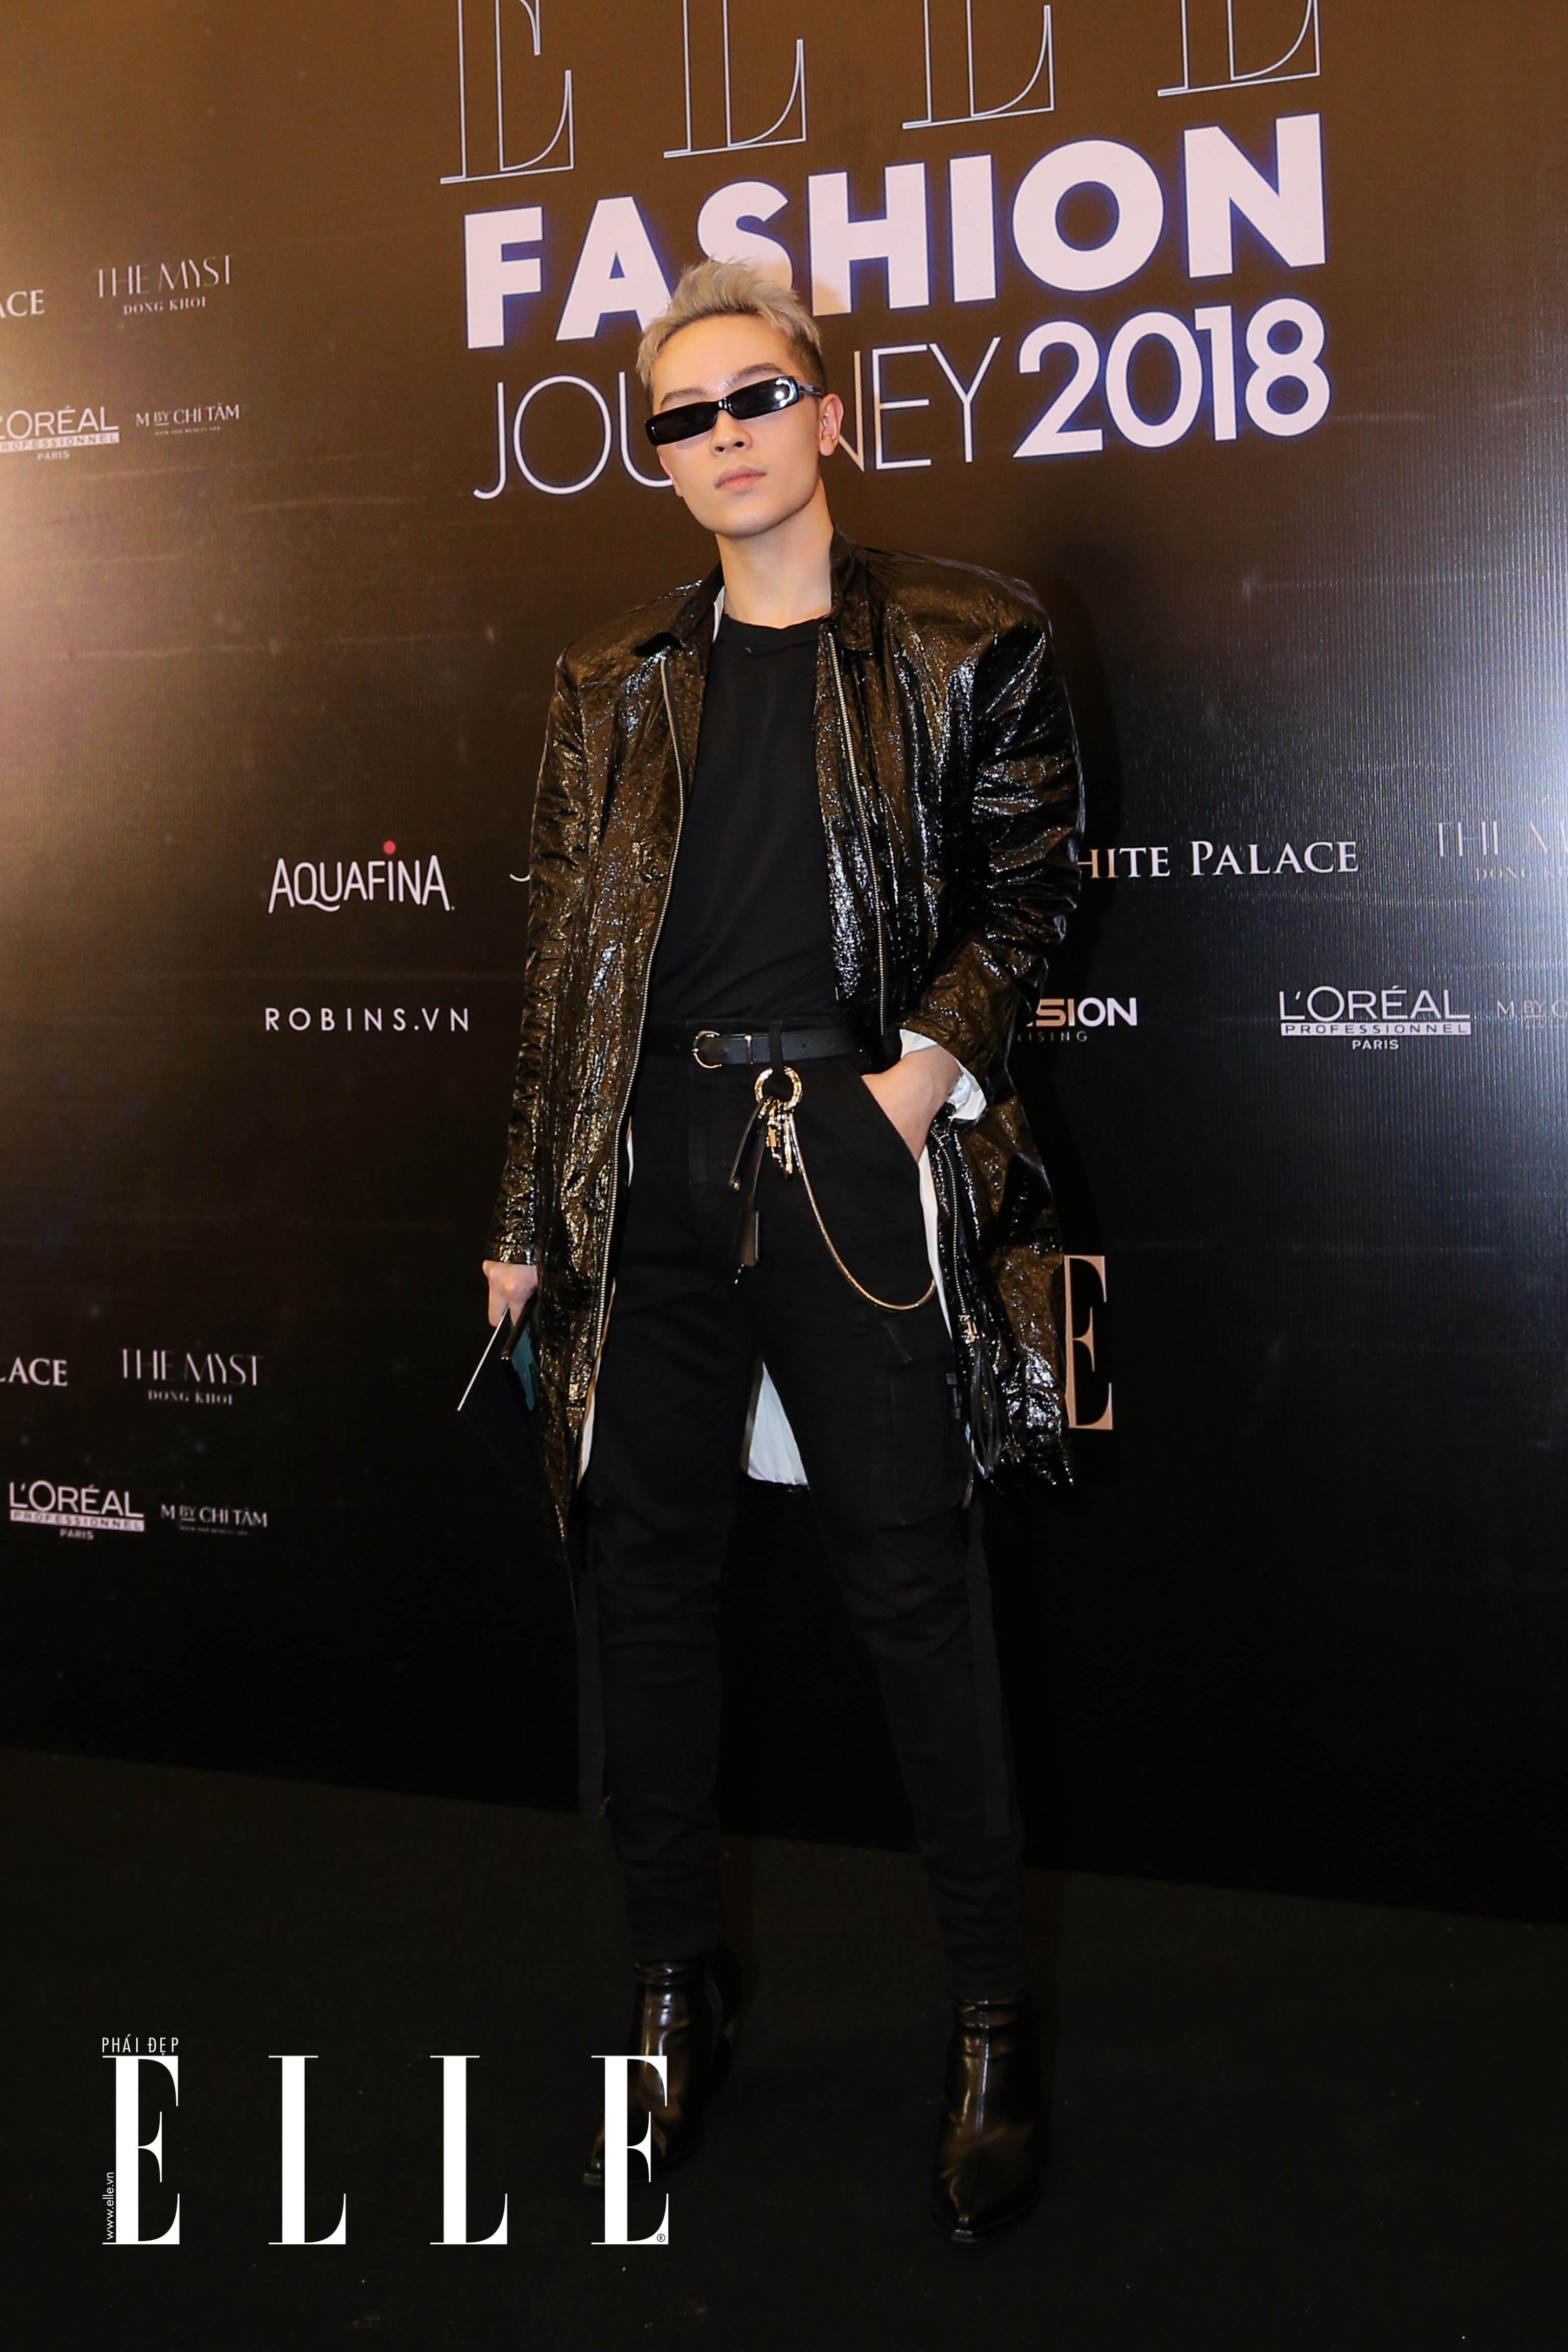 ELLE Fashion Journey tham do 12